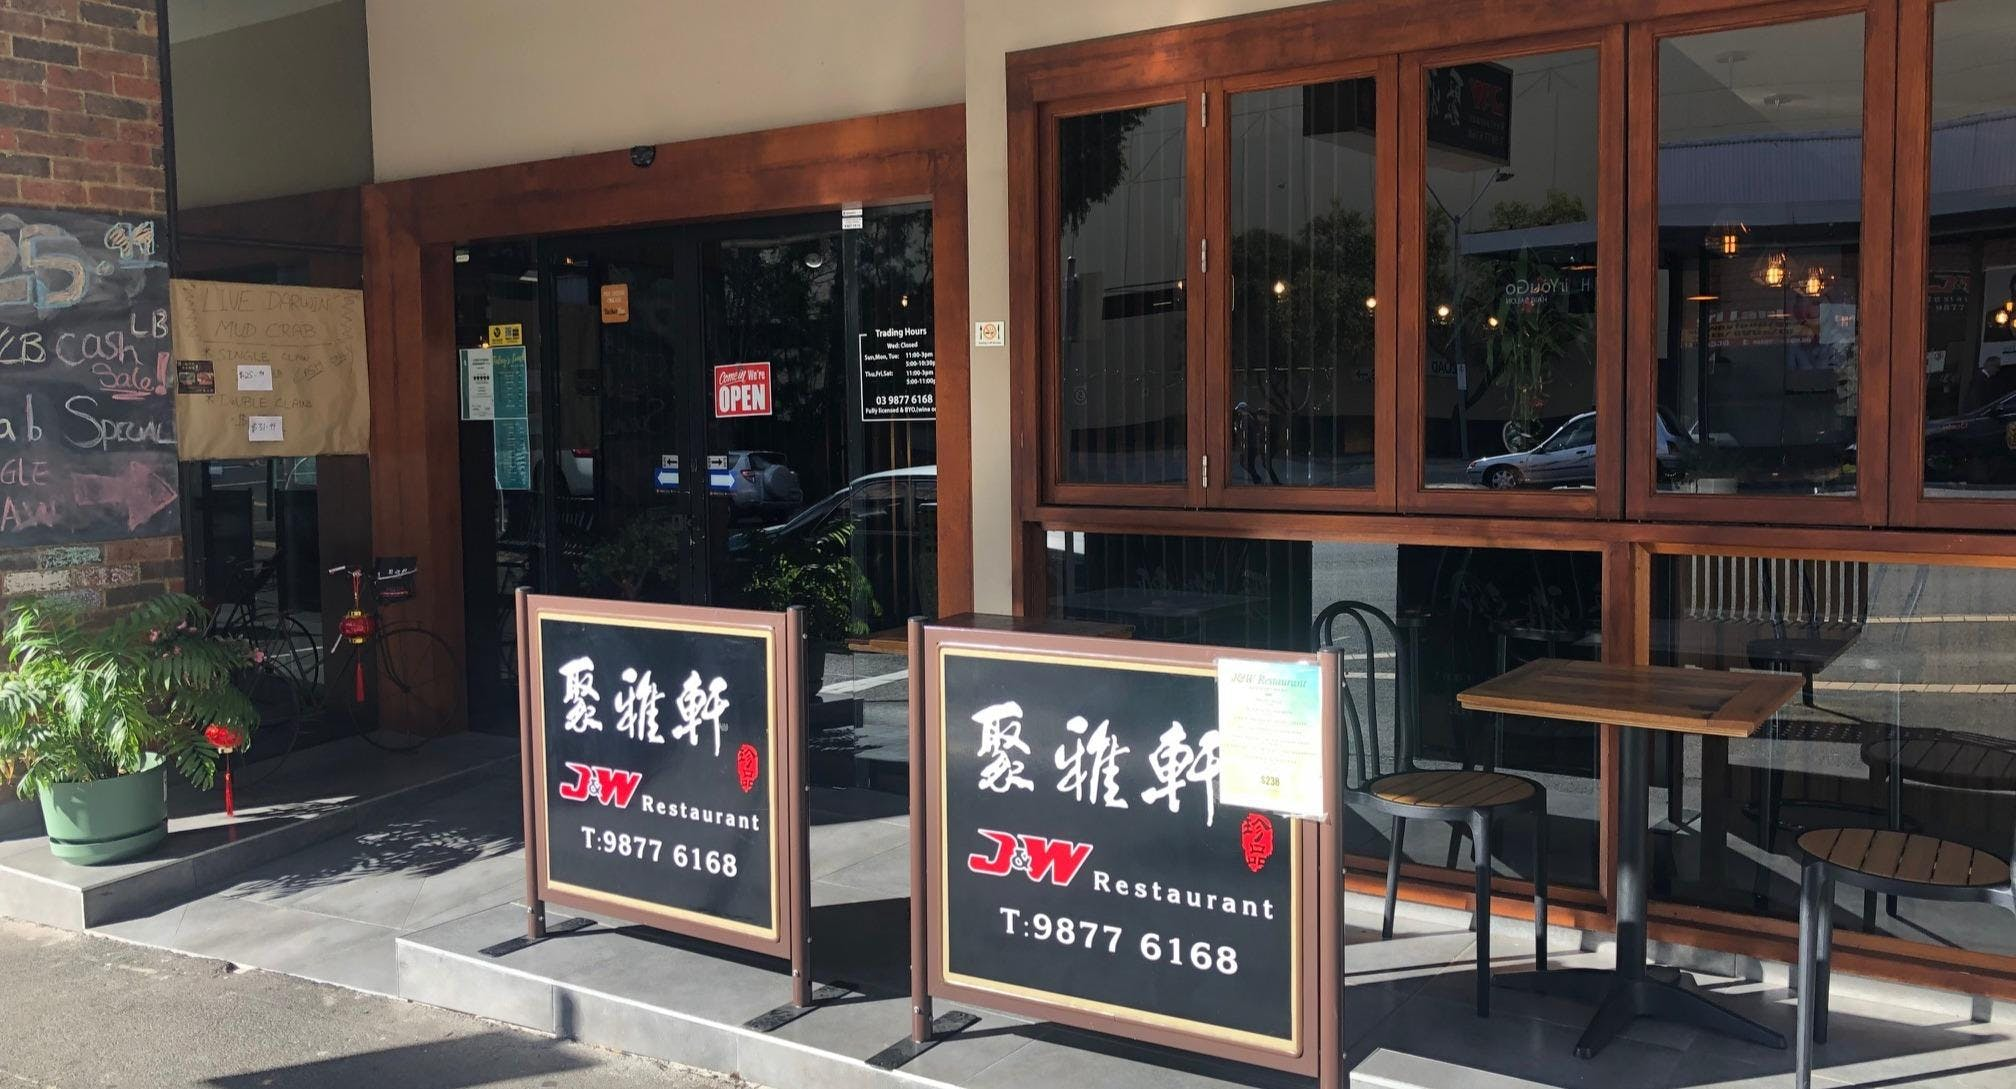 J&W Restaurant